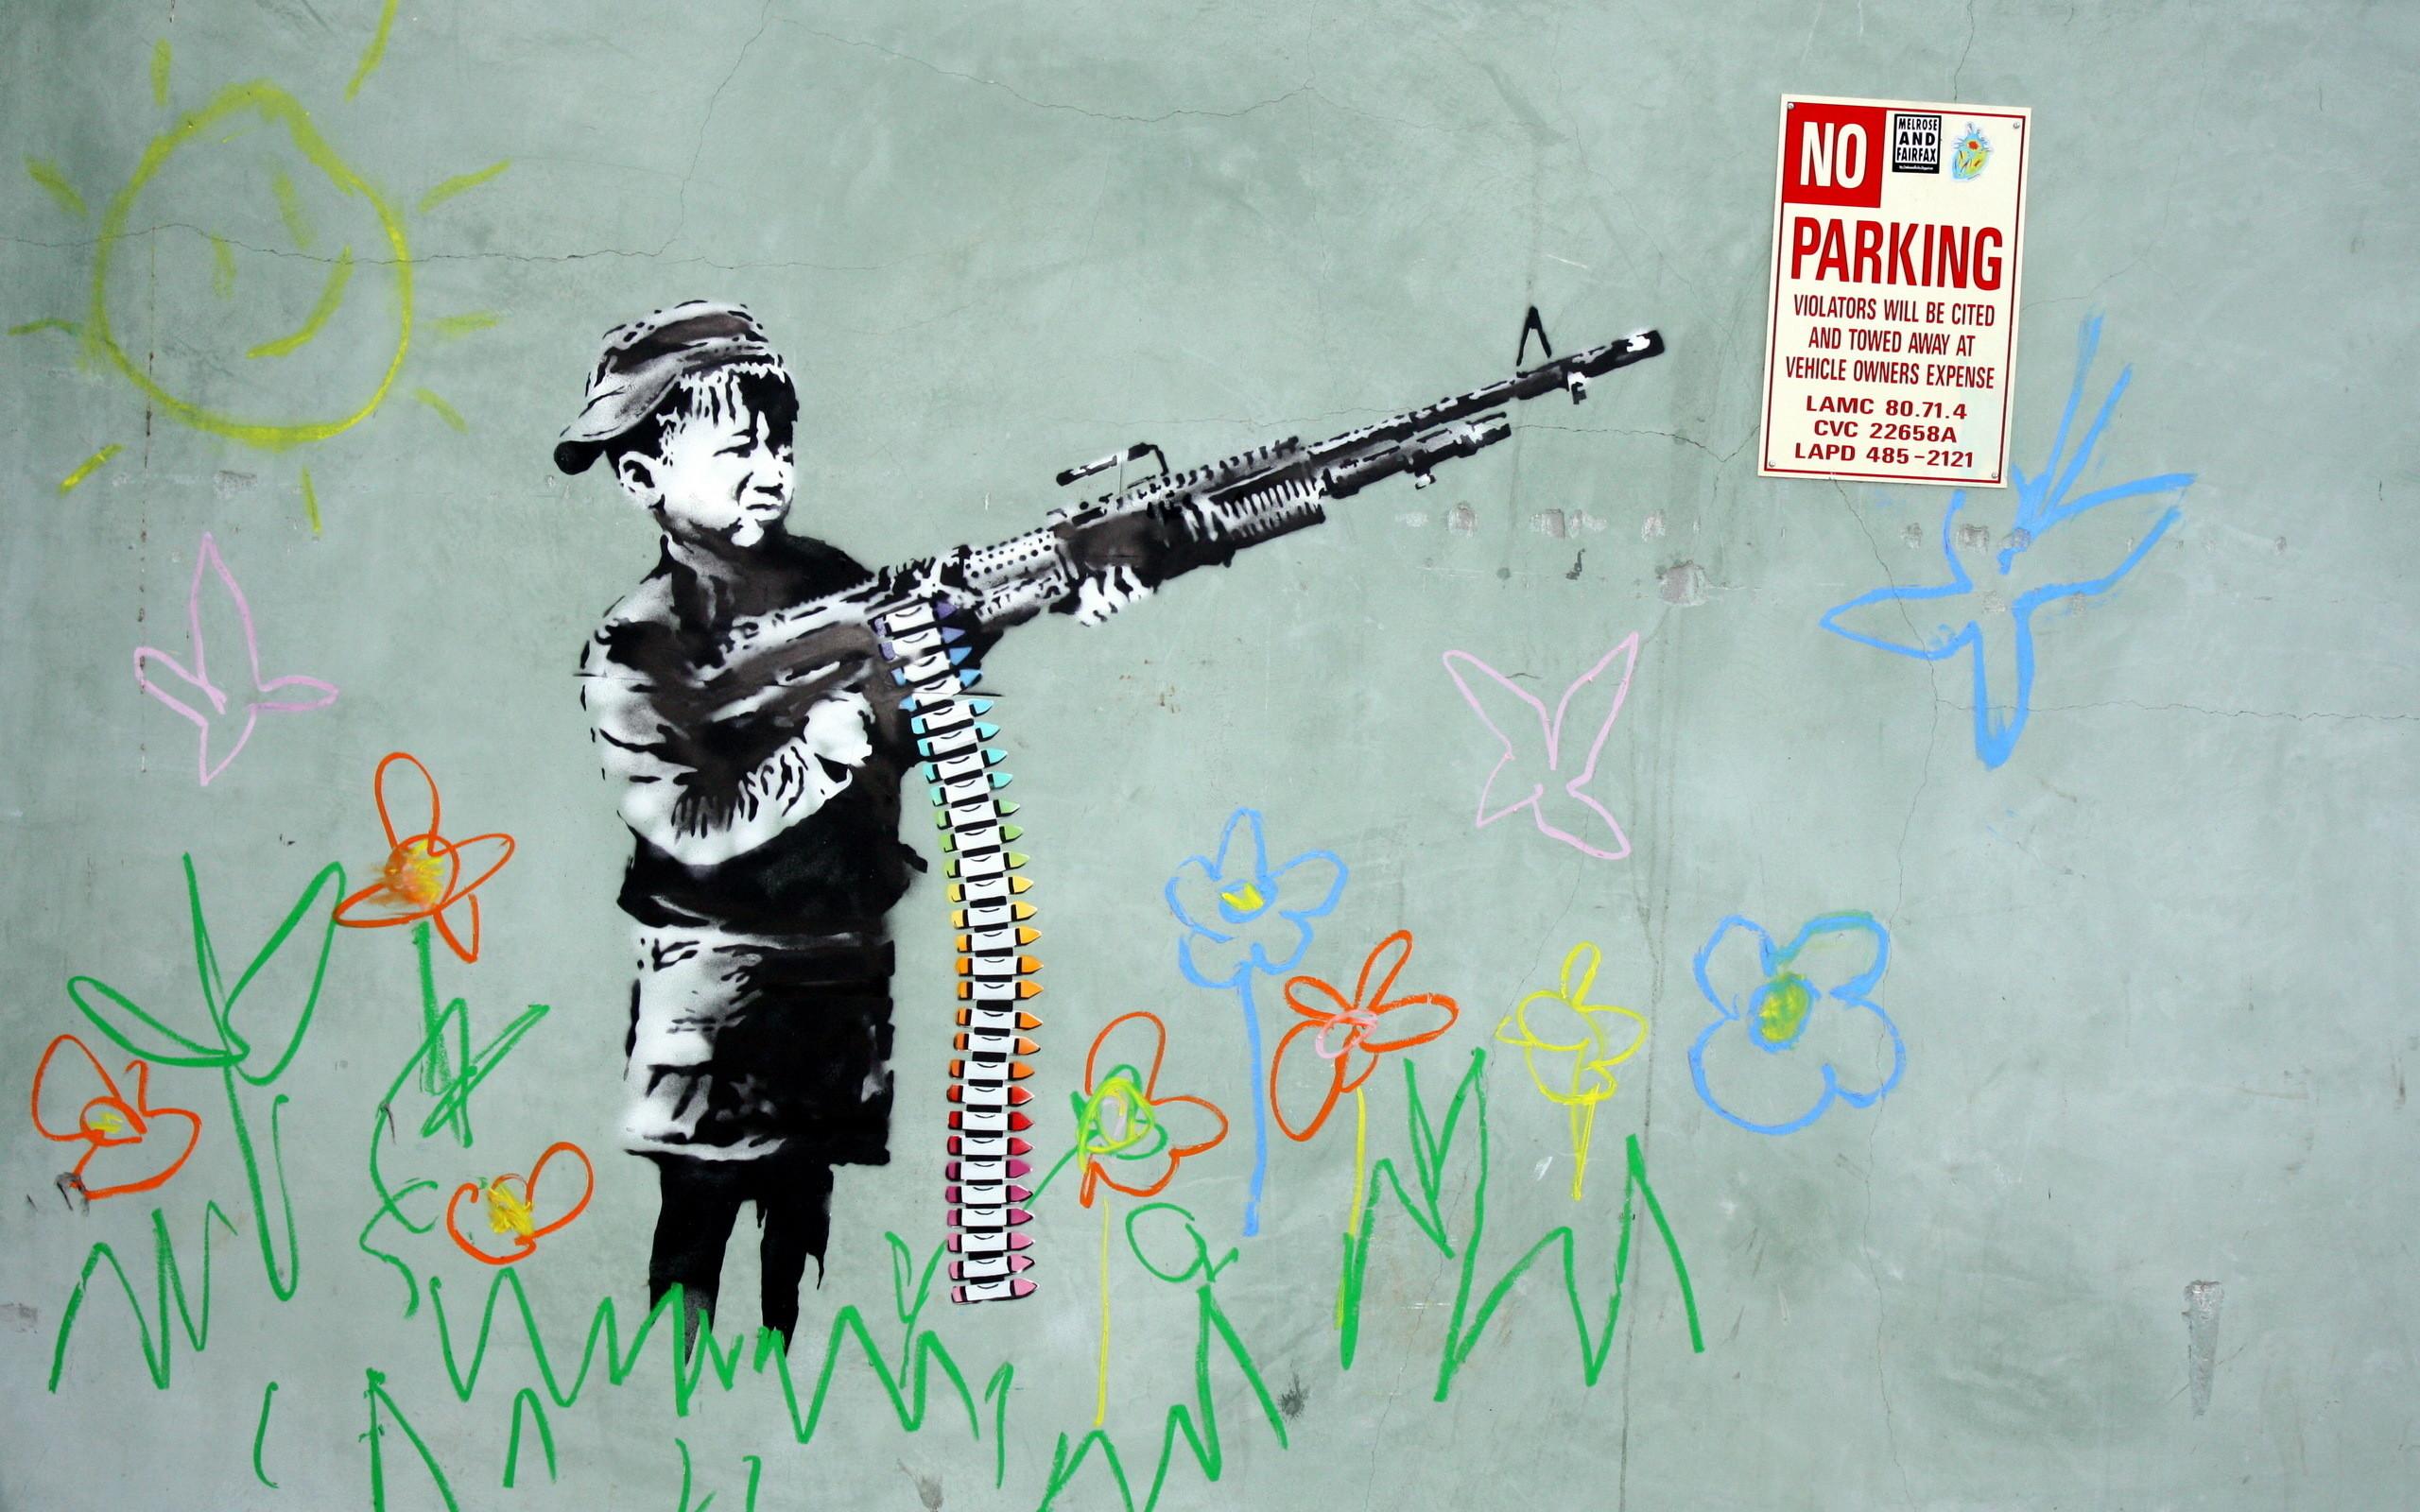 Banksy Wallpaper Hd 183 ① Wallpapertag